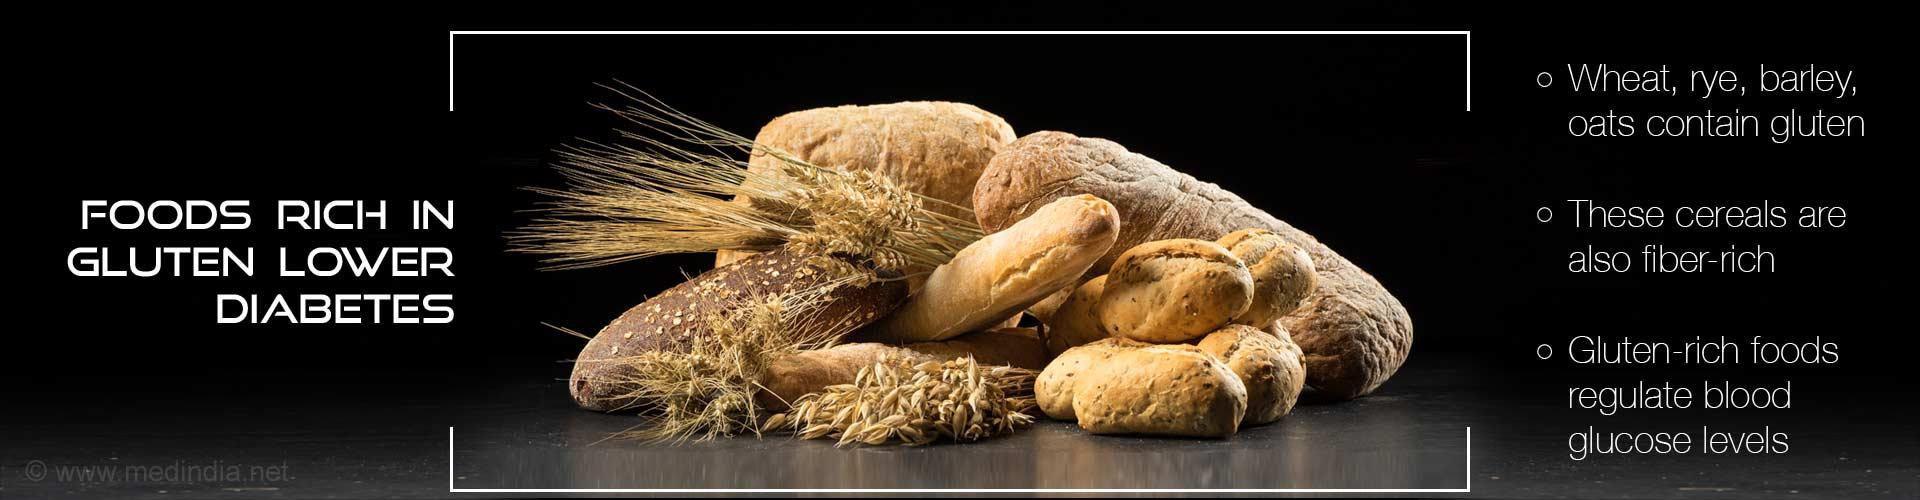 Gluten in Wheat, Rye, Barley Reduces Risk Of Type 2 Diabetes